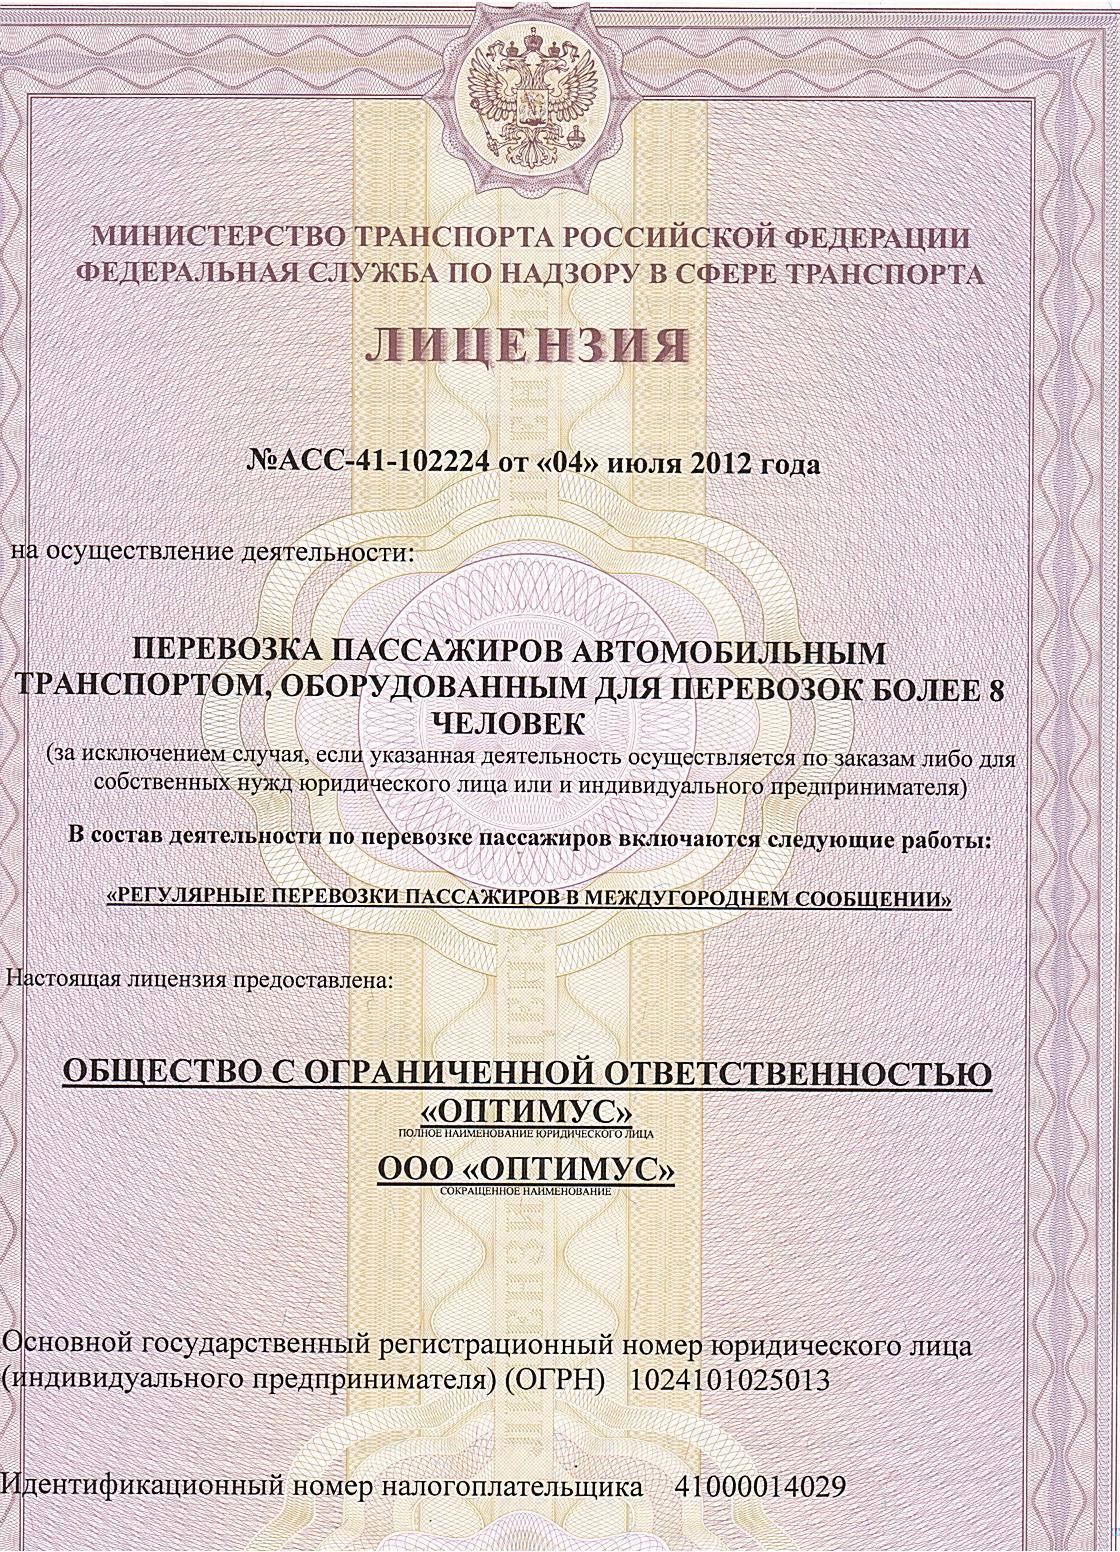 http://autobuspk.ru/files/licenziya.jpg